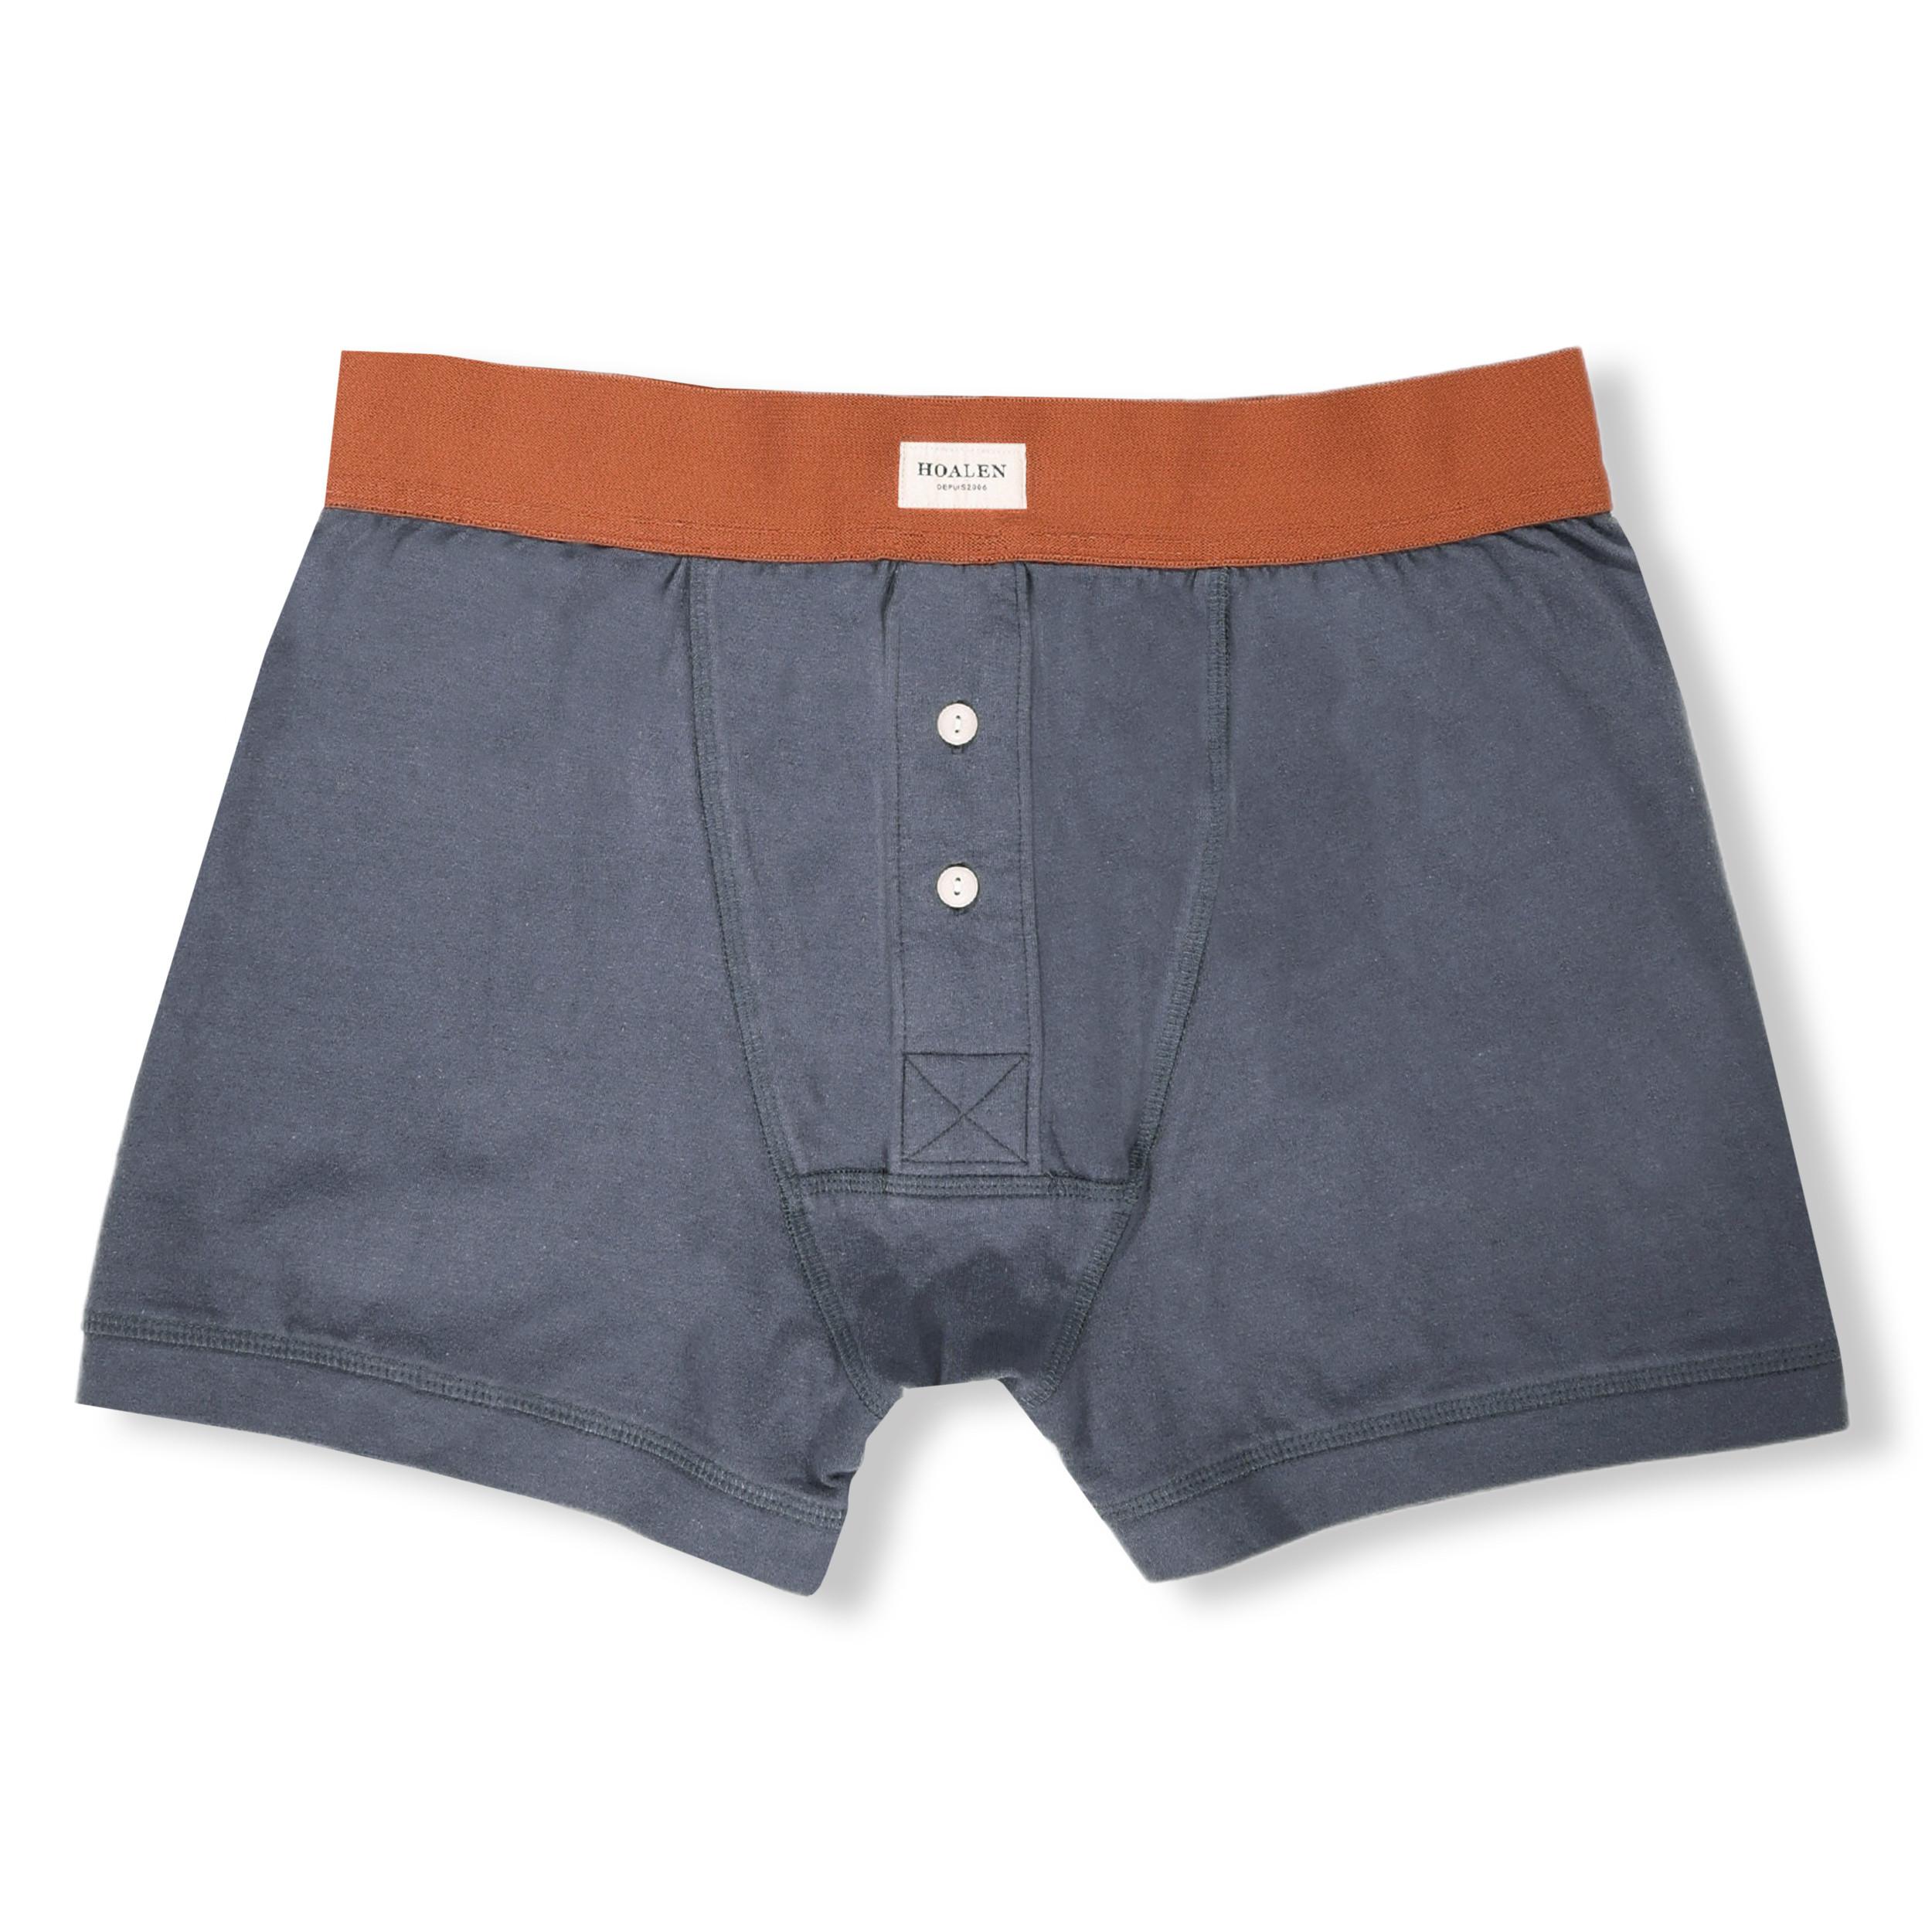 Comfy boxer shorts